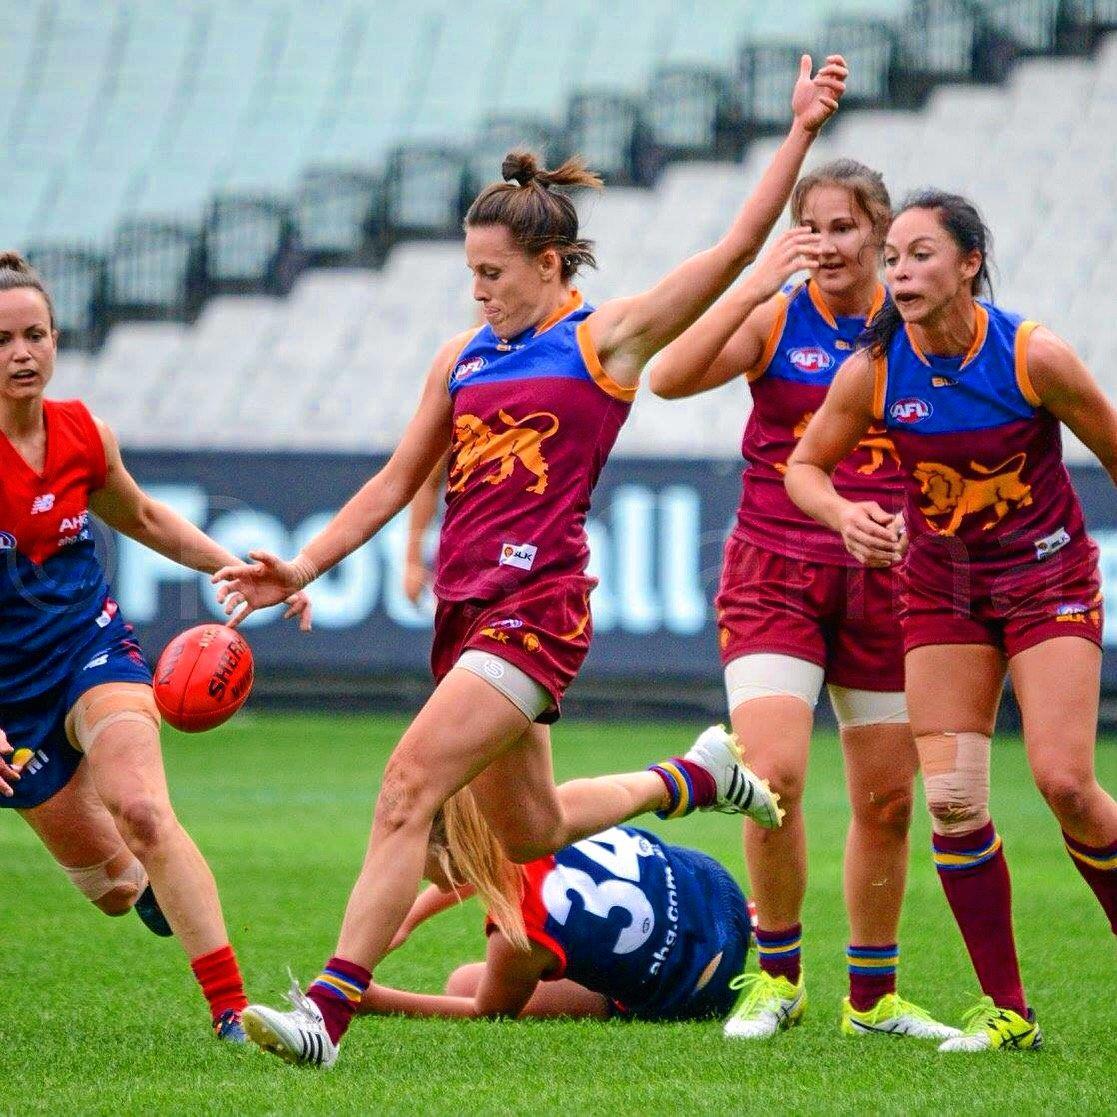 Bundaberg's Emma Zielke in action for the Brisbane Lions against Melbourne.